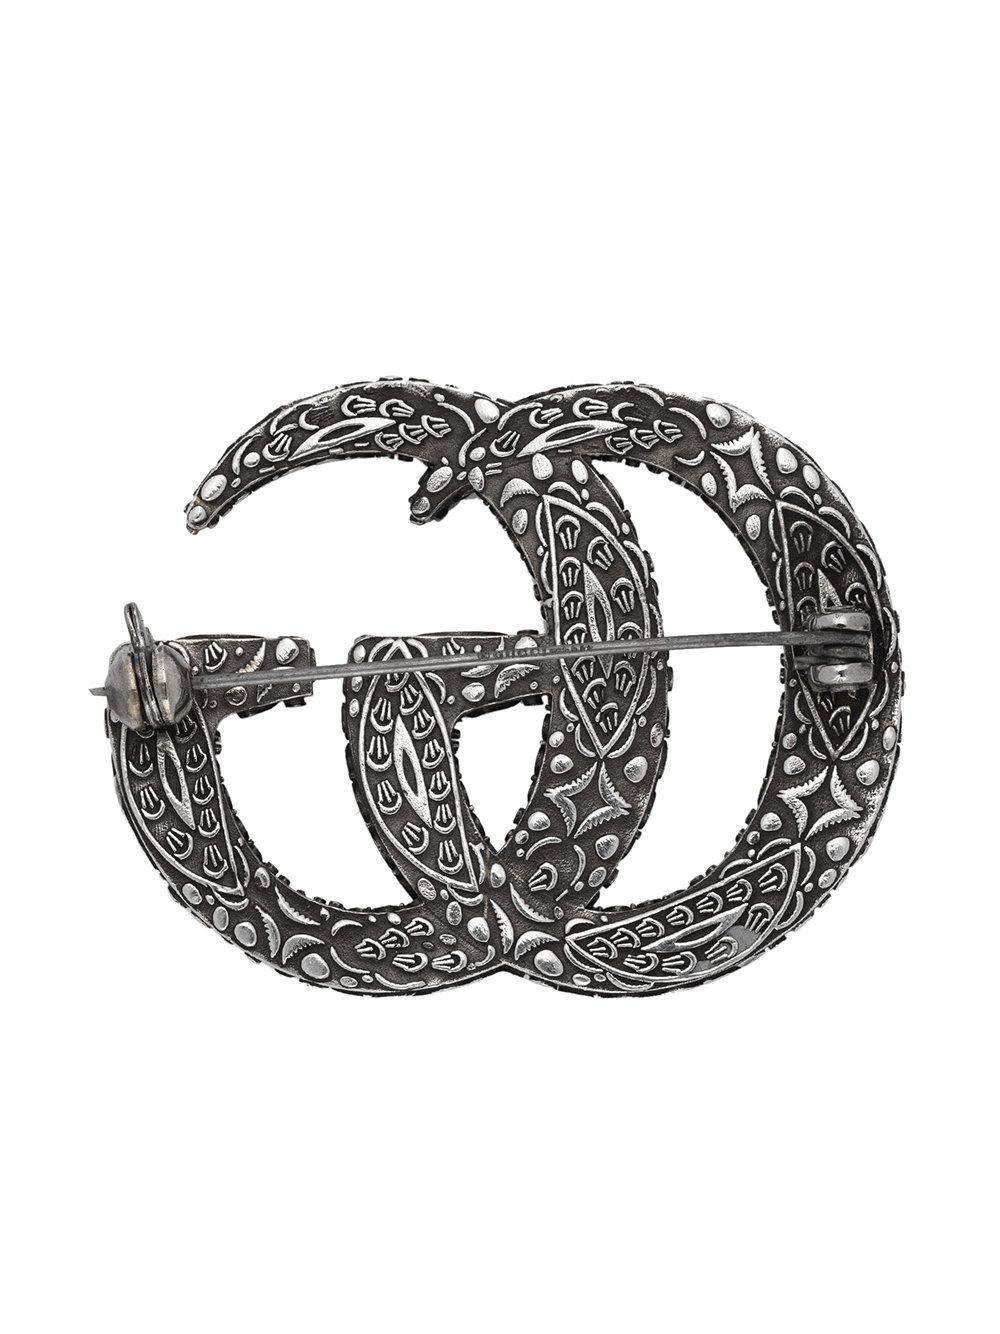 Enameled Double G brooch - Metallic Gucci uivYABtmh